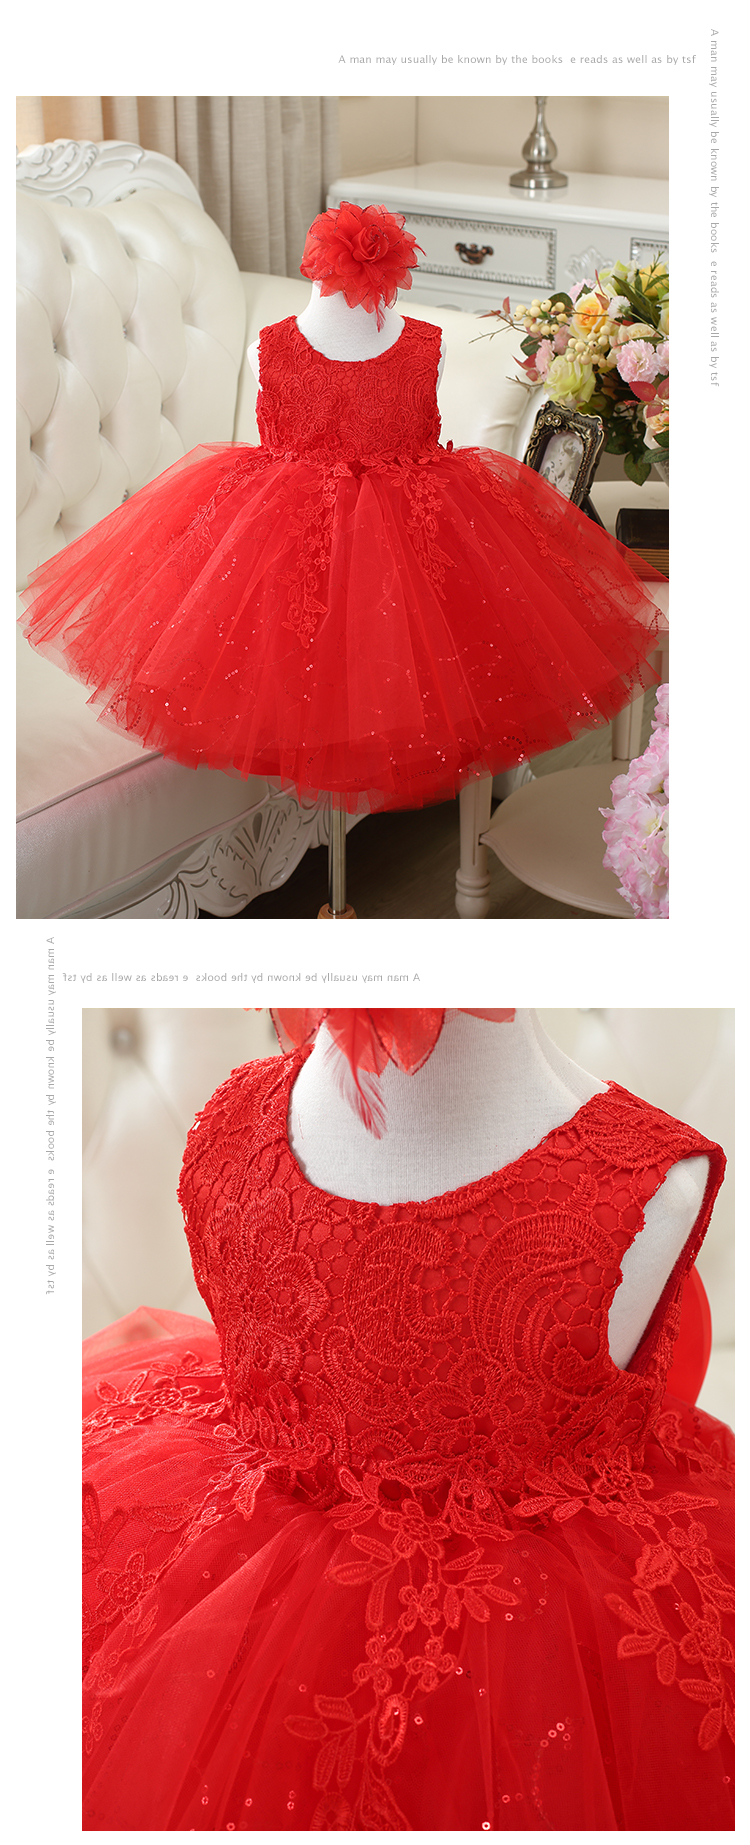 HTB1EEJAFuuSBuNjSsziq6zq8pXa2 2019 Kids Tutu Birthday Princess Party Dress for Girls Infant Lace Children Bridesmaid Elegant Dress for Girl baby Girls Clothes